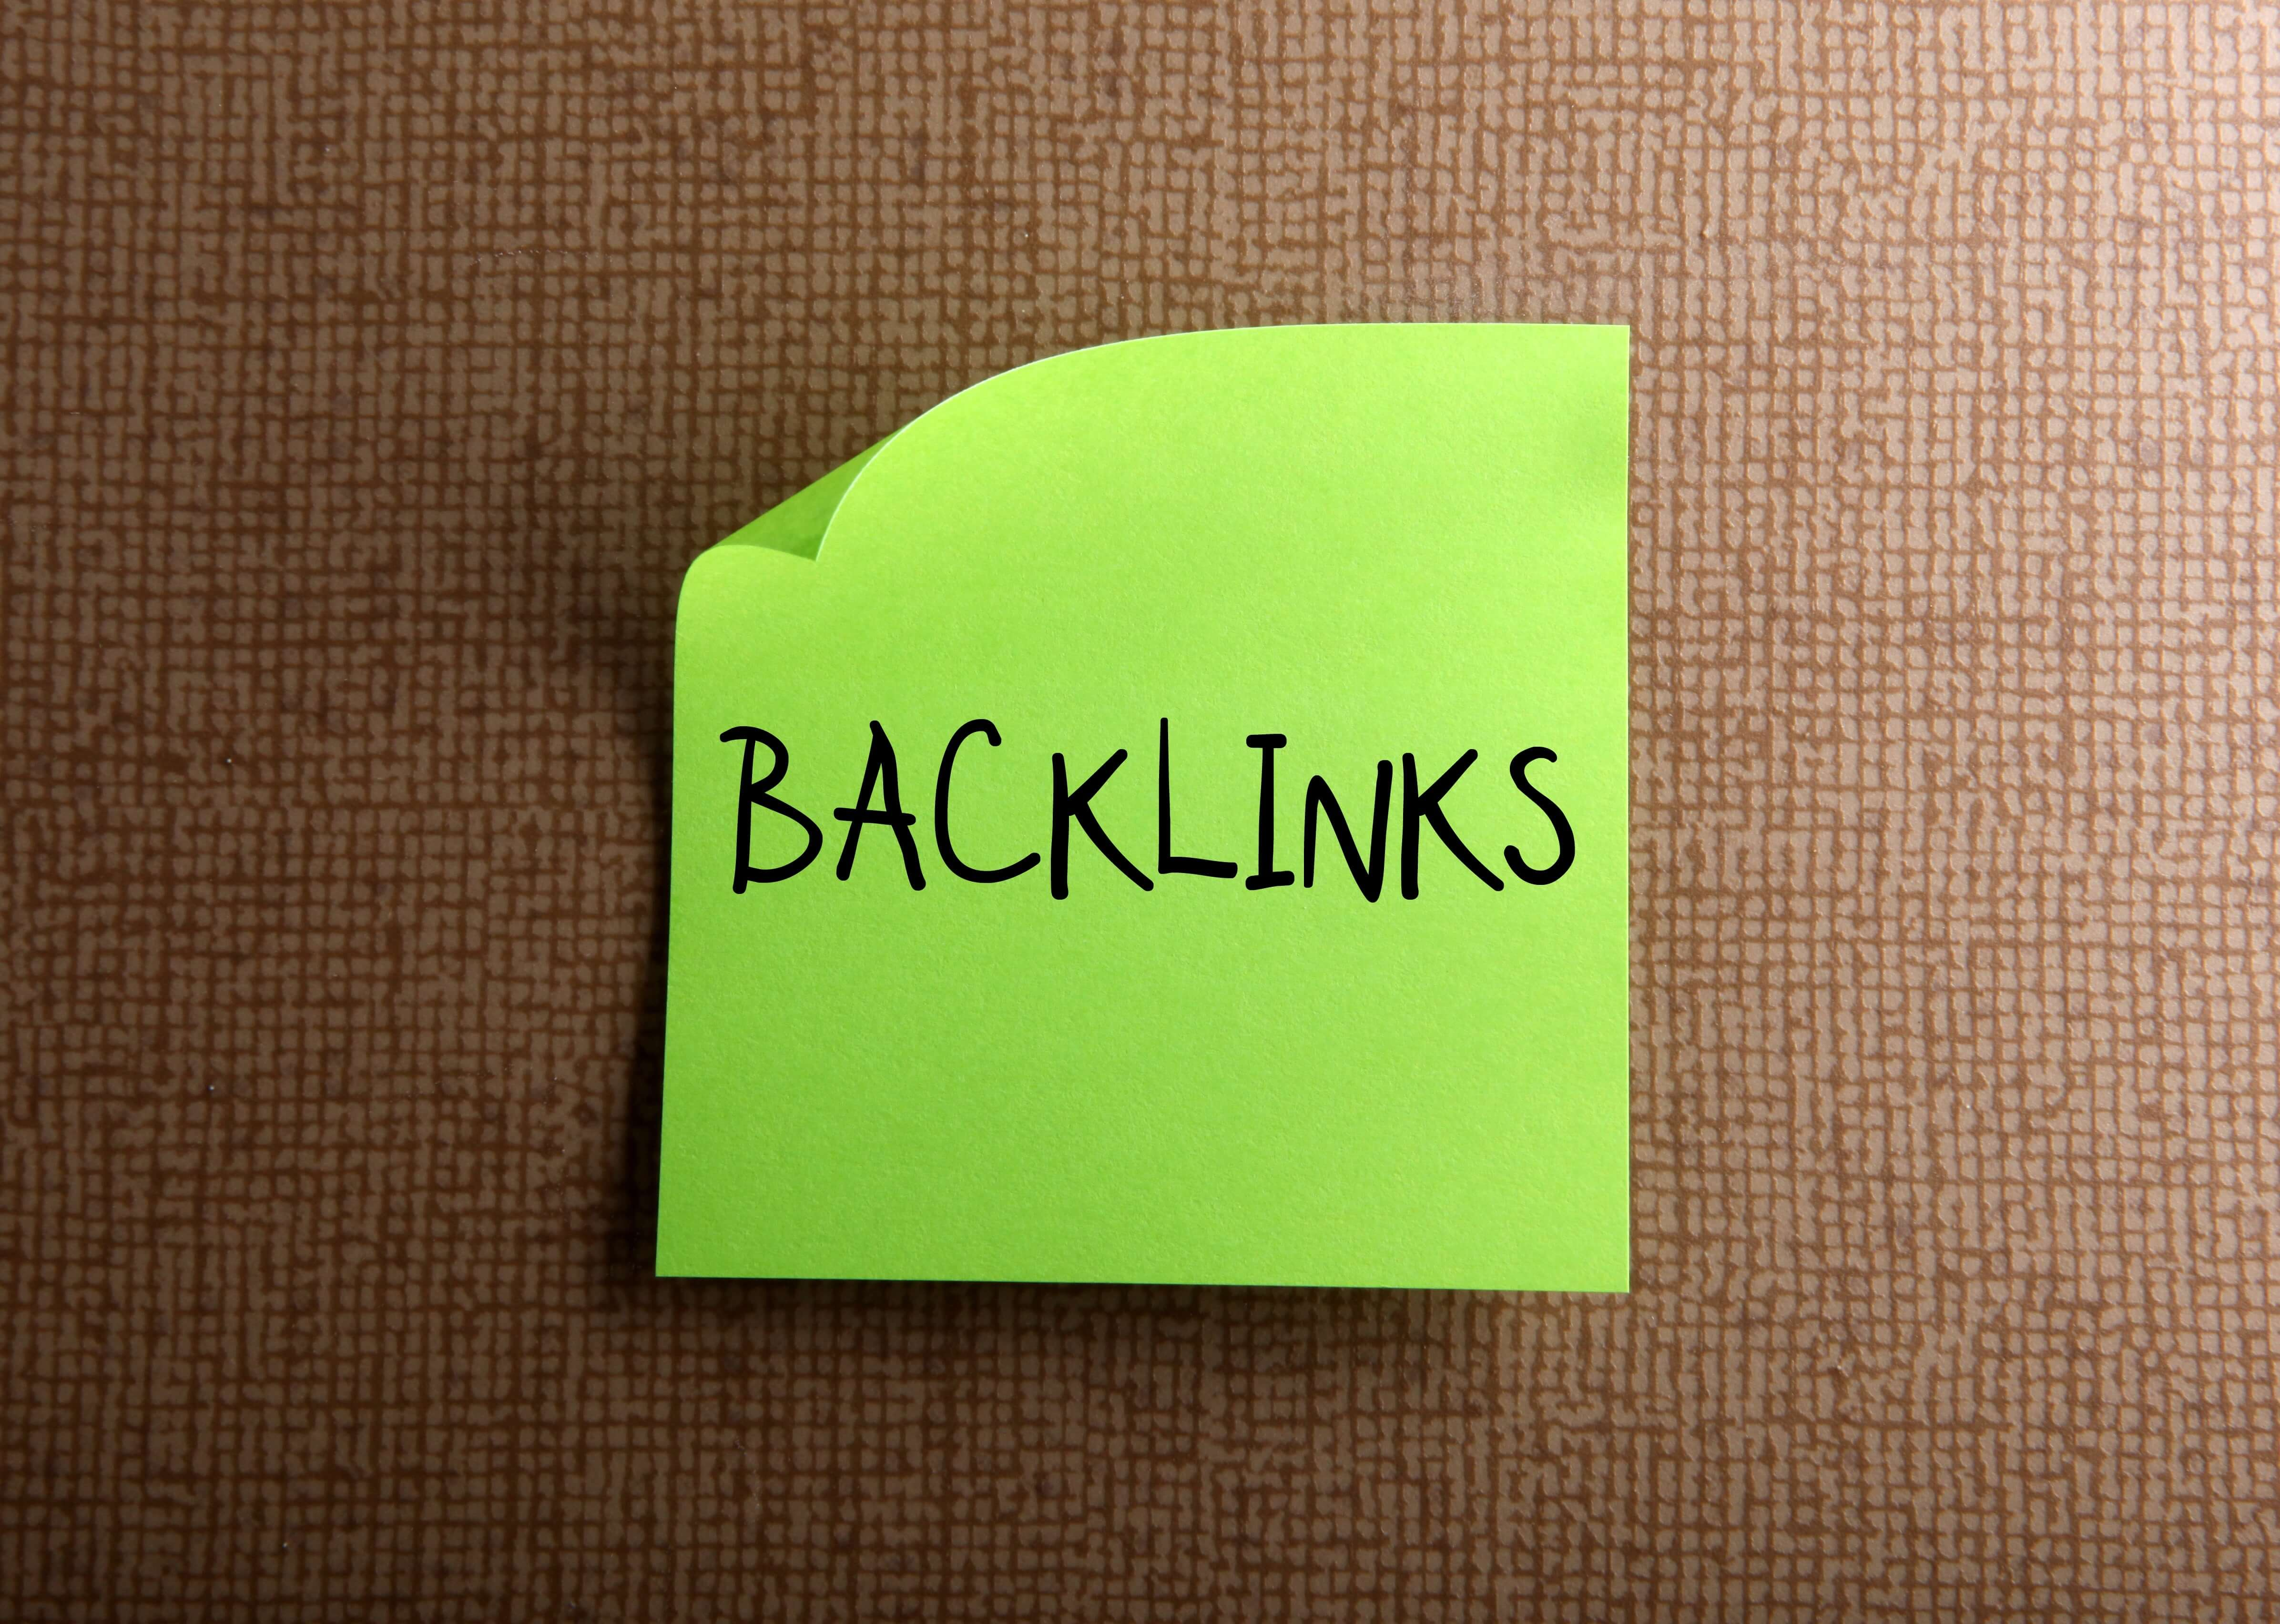 backlinks-and-seo1